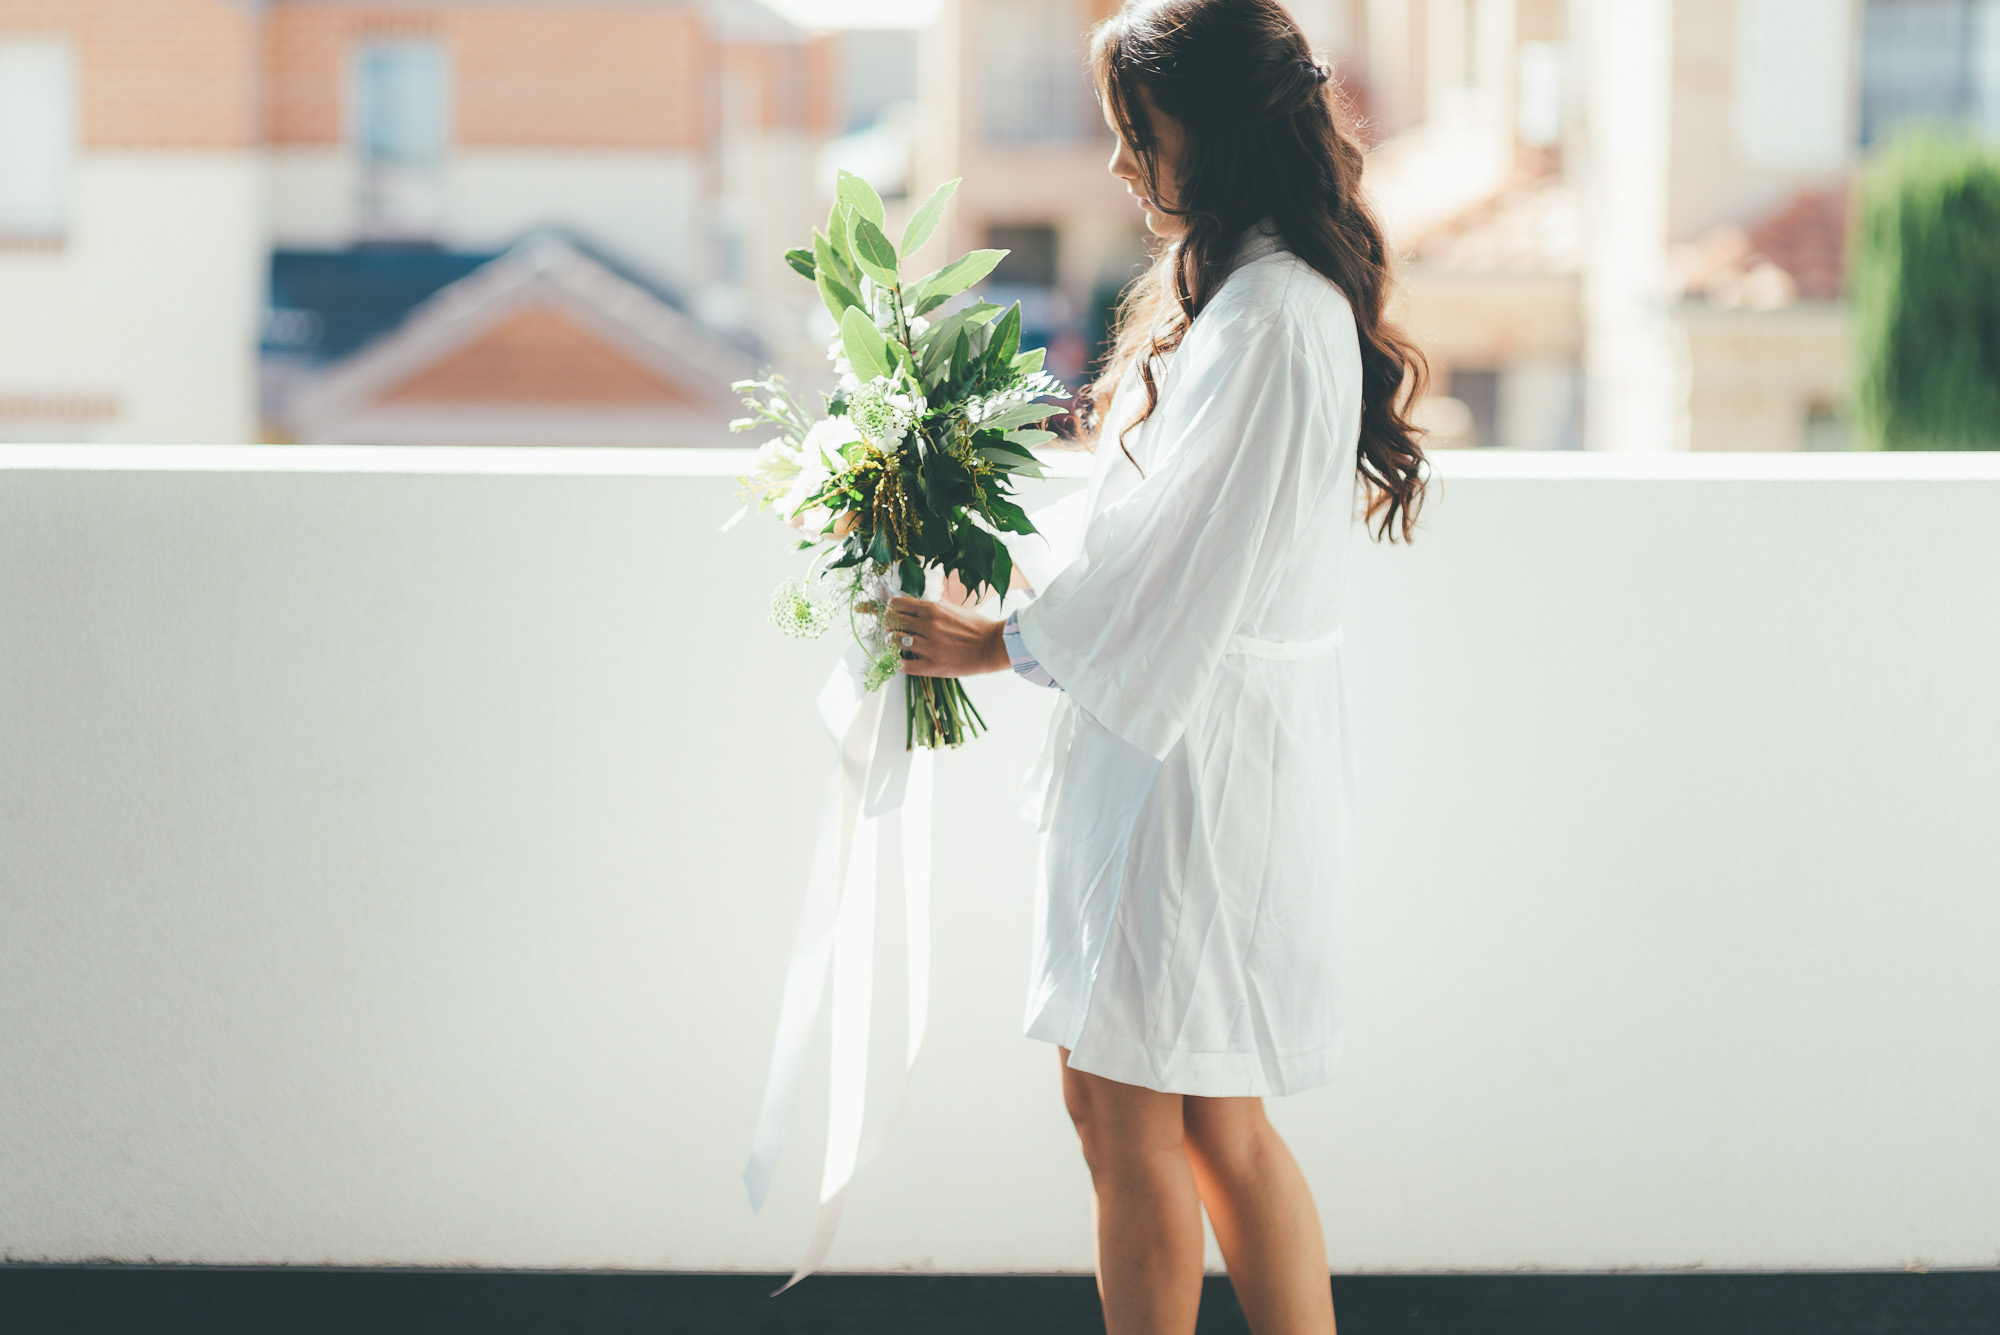 wedding-photographer-outdoor-casual-styled-los-angeles-australia-california-international-earthbound -15.jpg